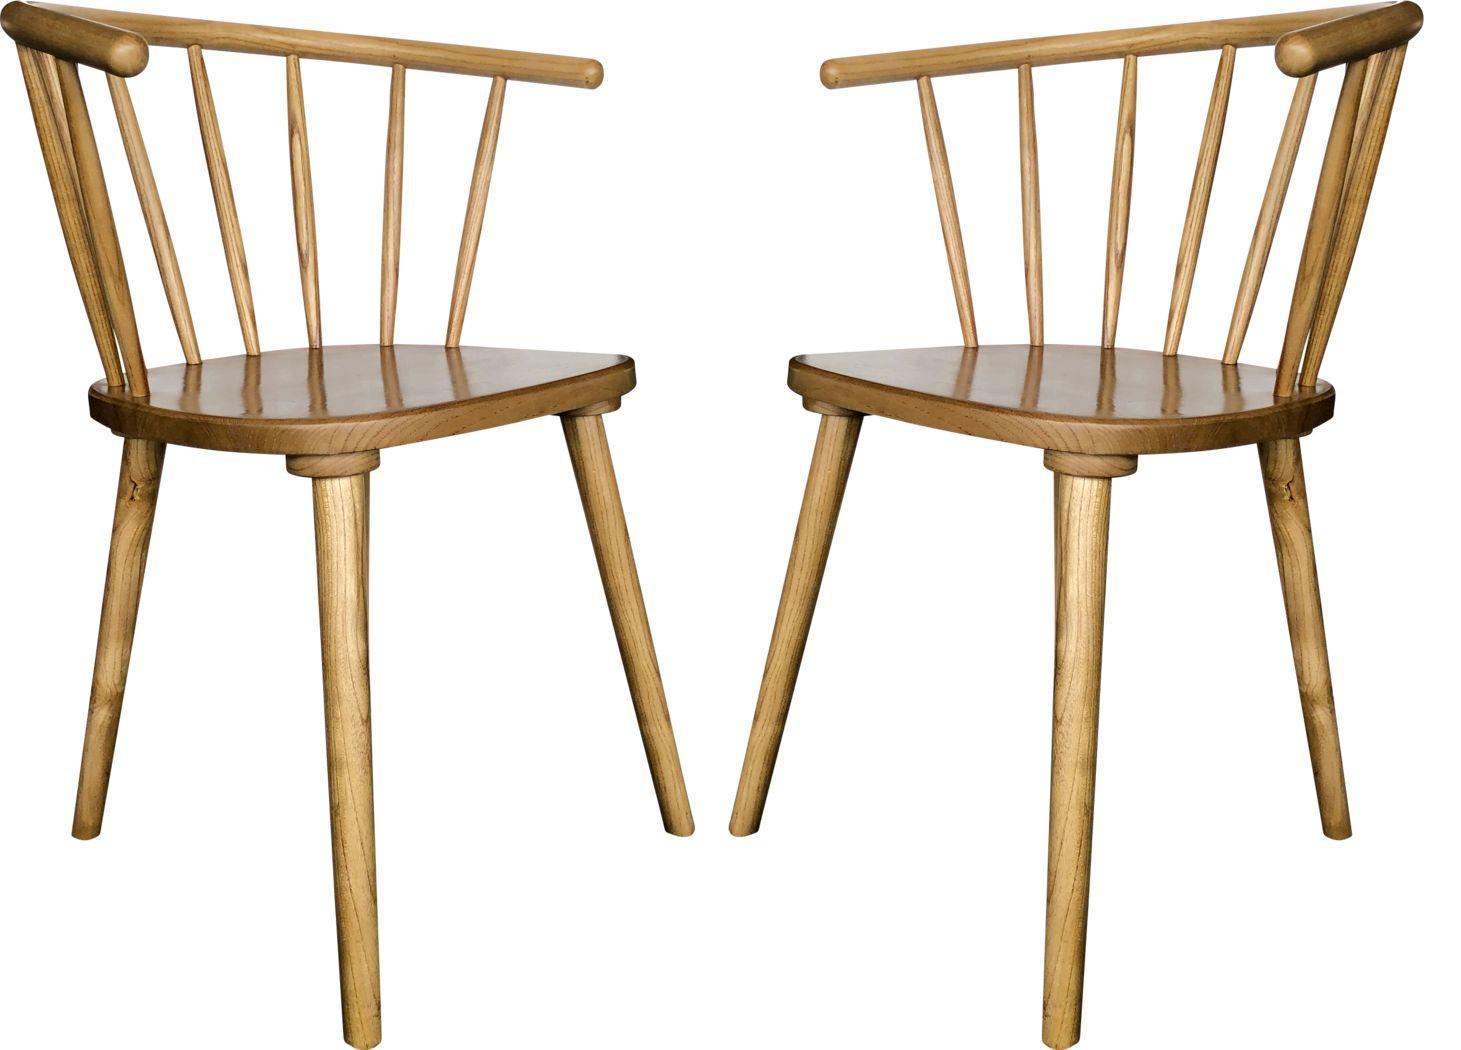 Lemonwood Natural Dining Chair, Set of 2